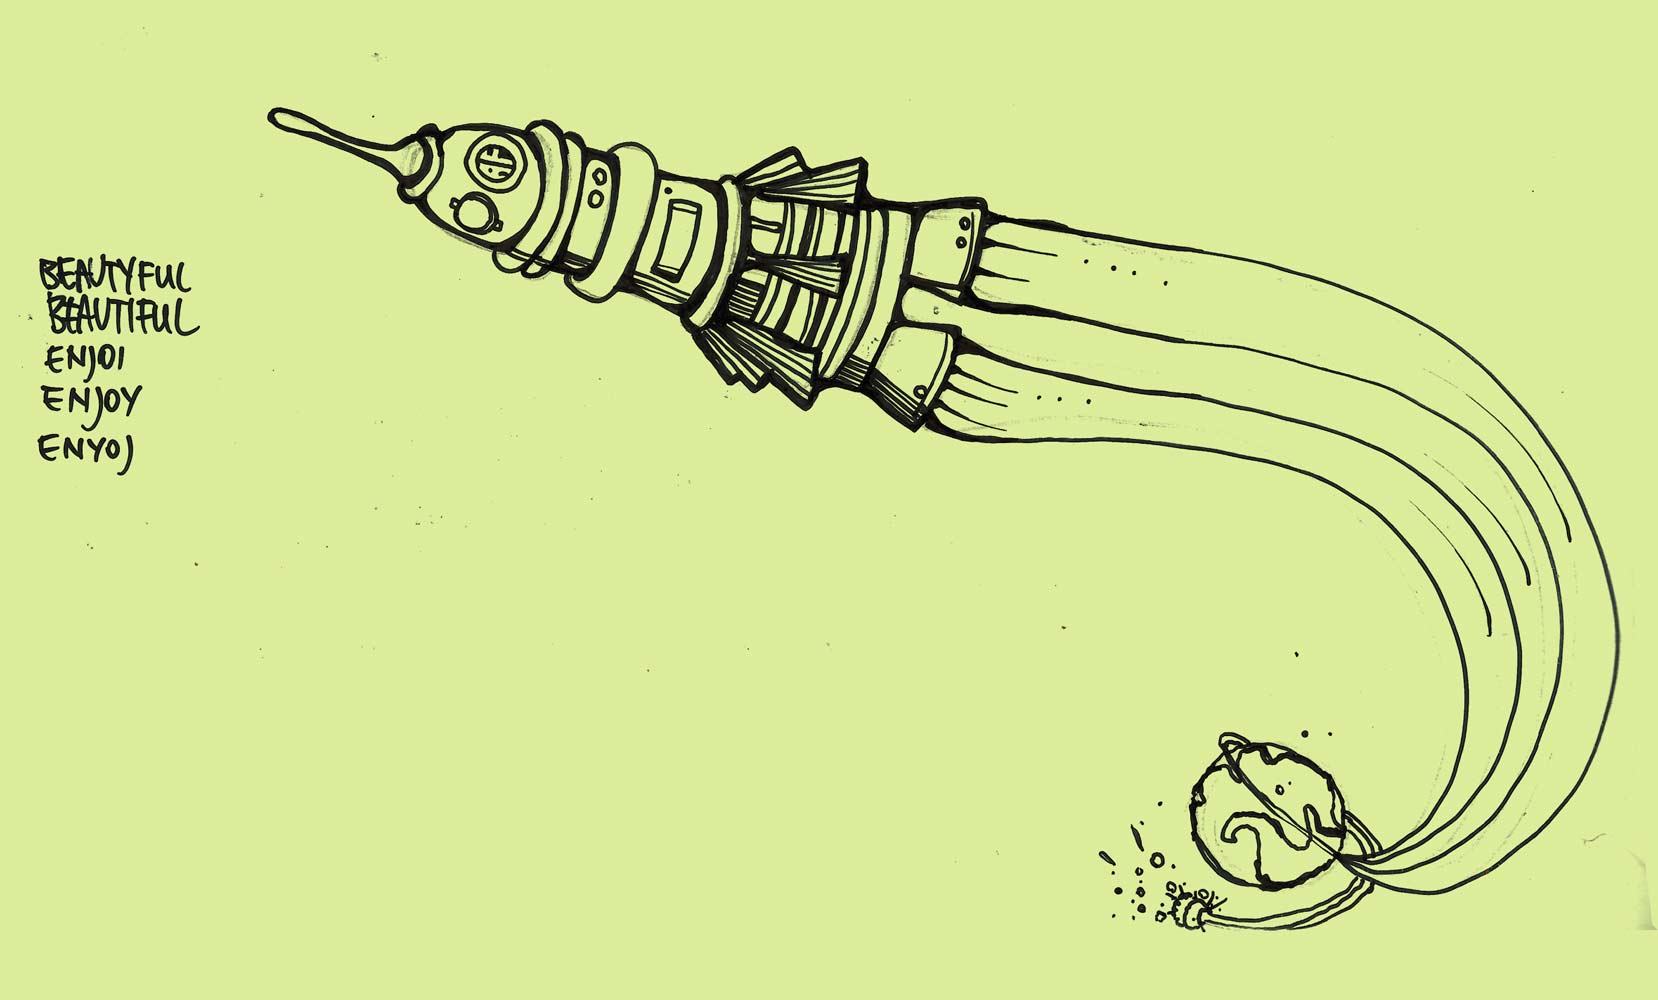 eclipse_surfboard_artwork_eclipseland_rocket